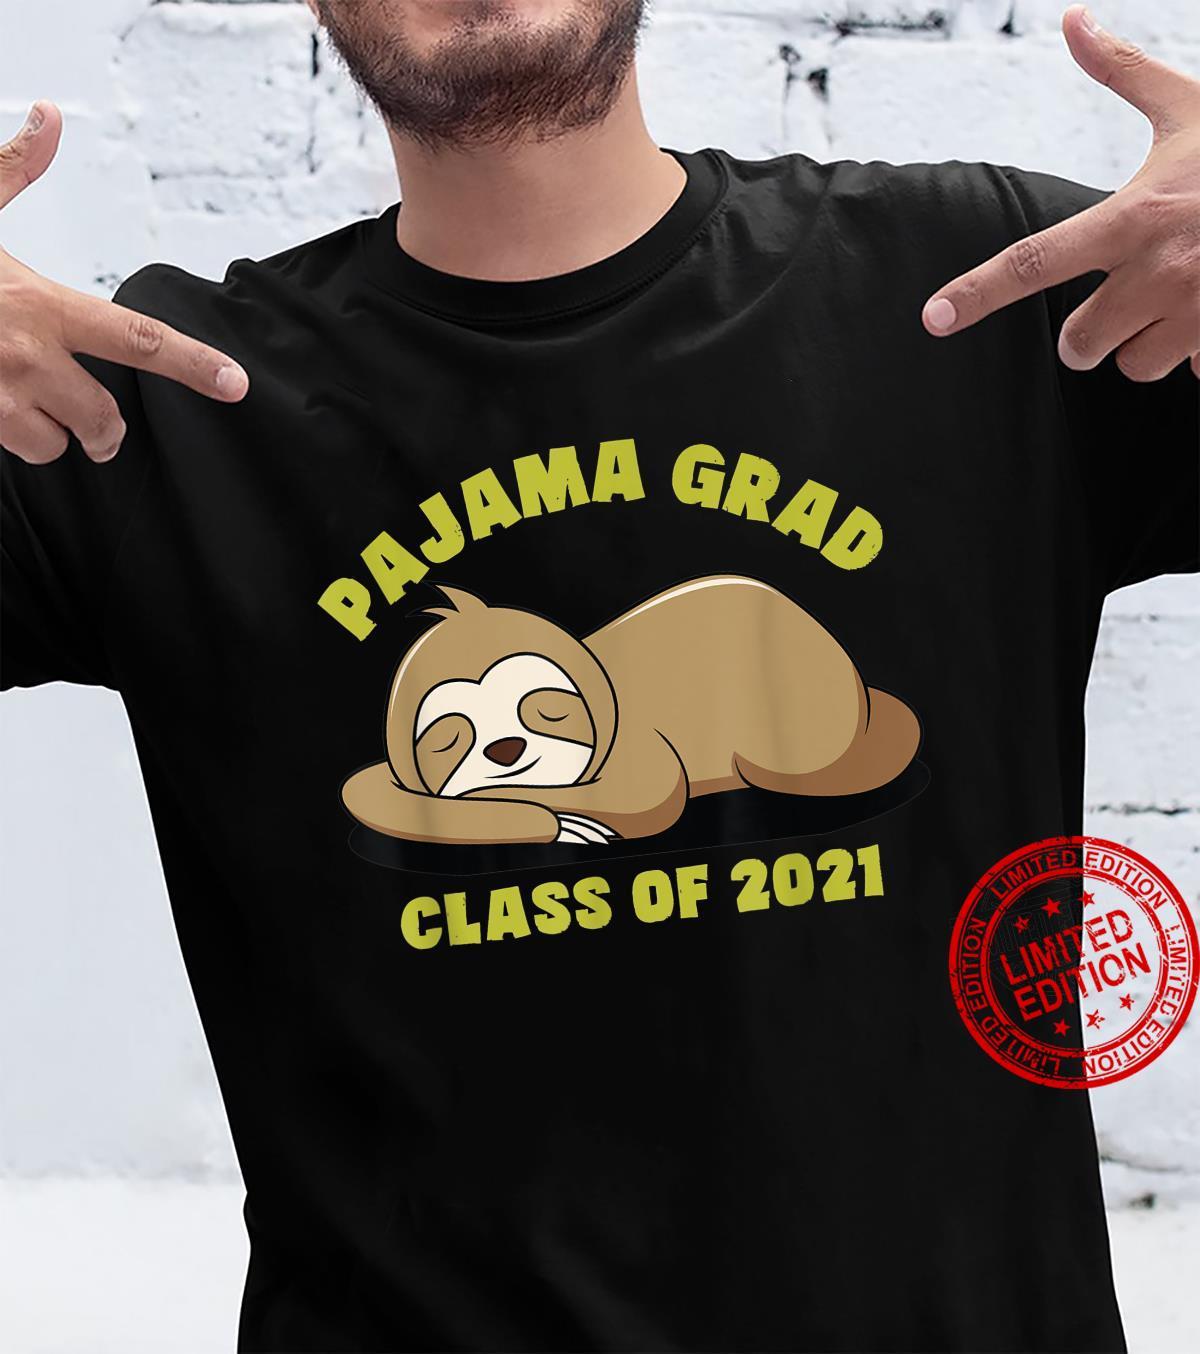 Funny Graduation Shirt